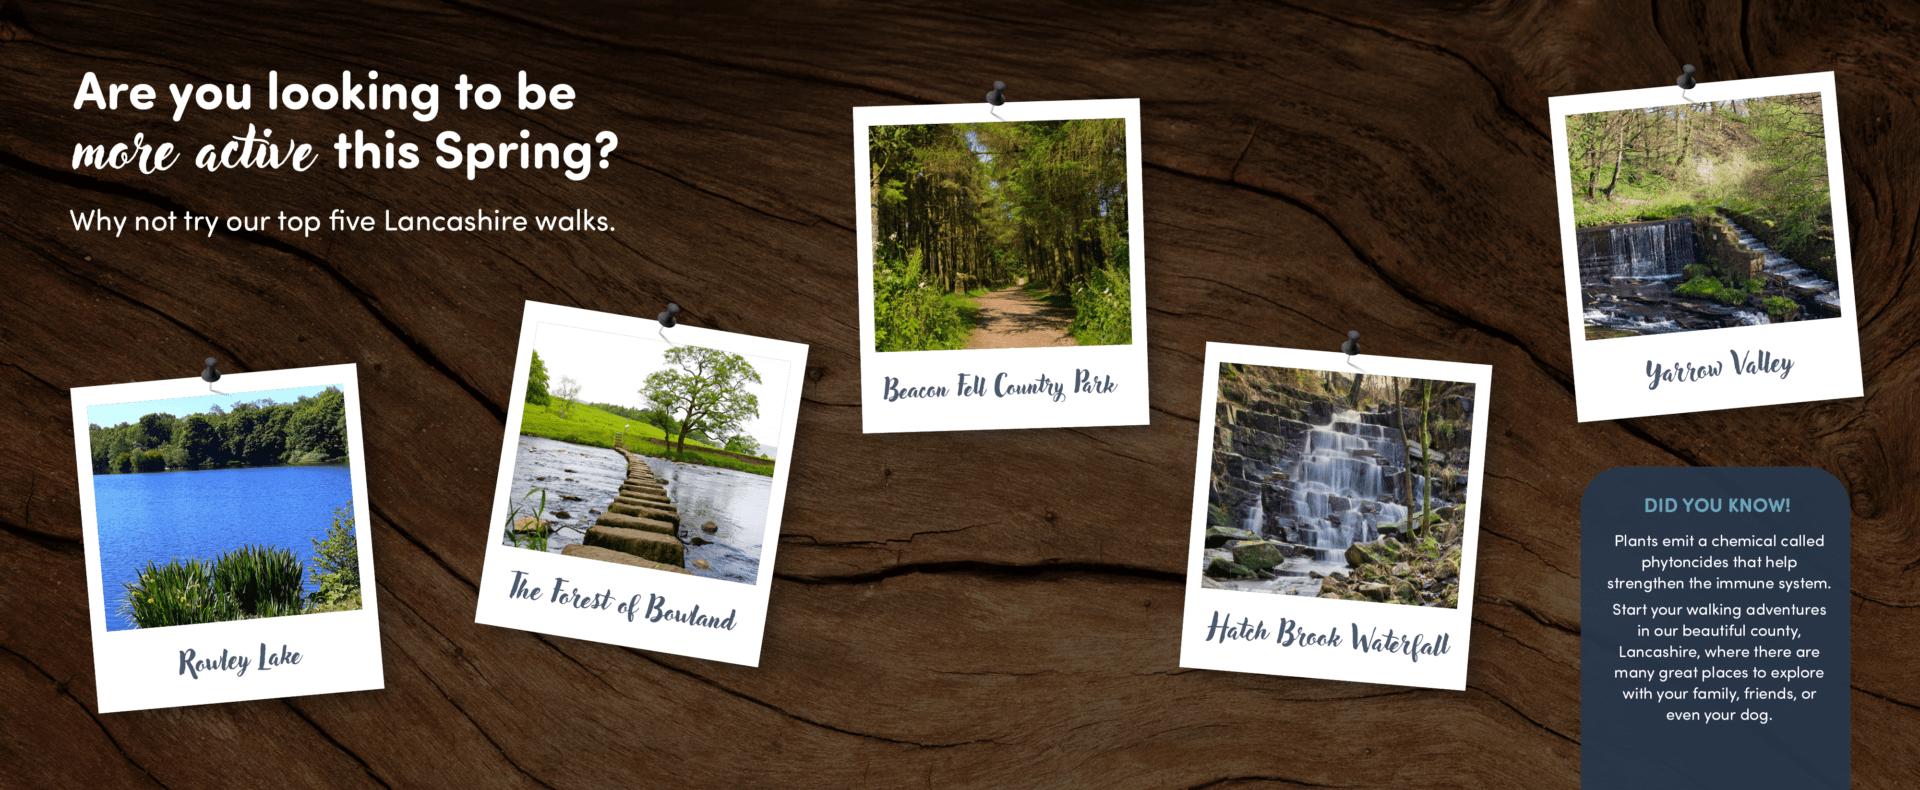 Image of Top five Lancashire Walks